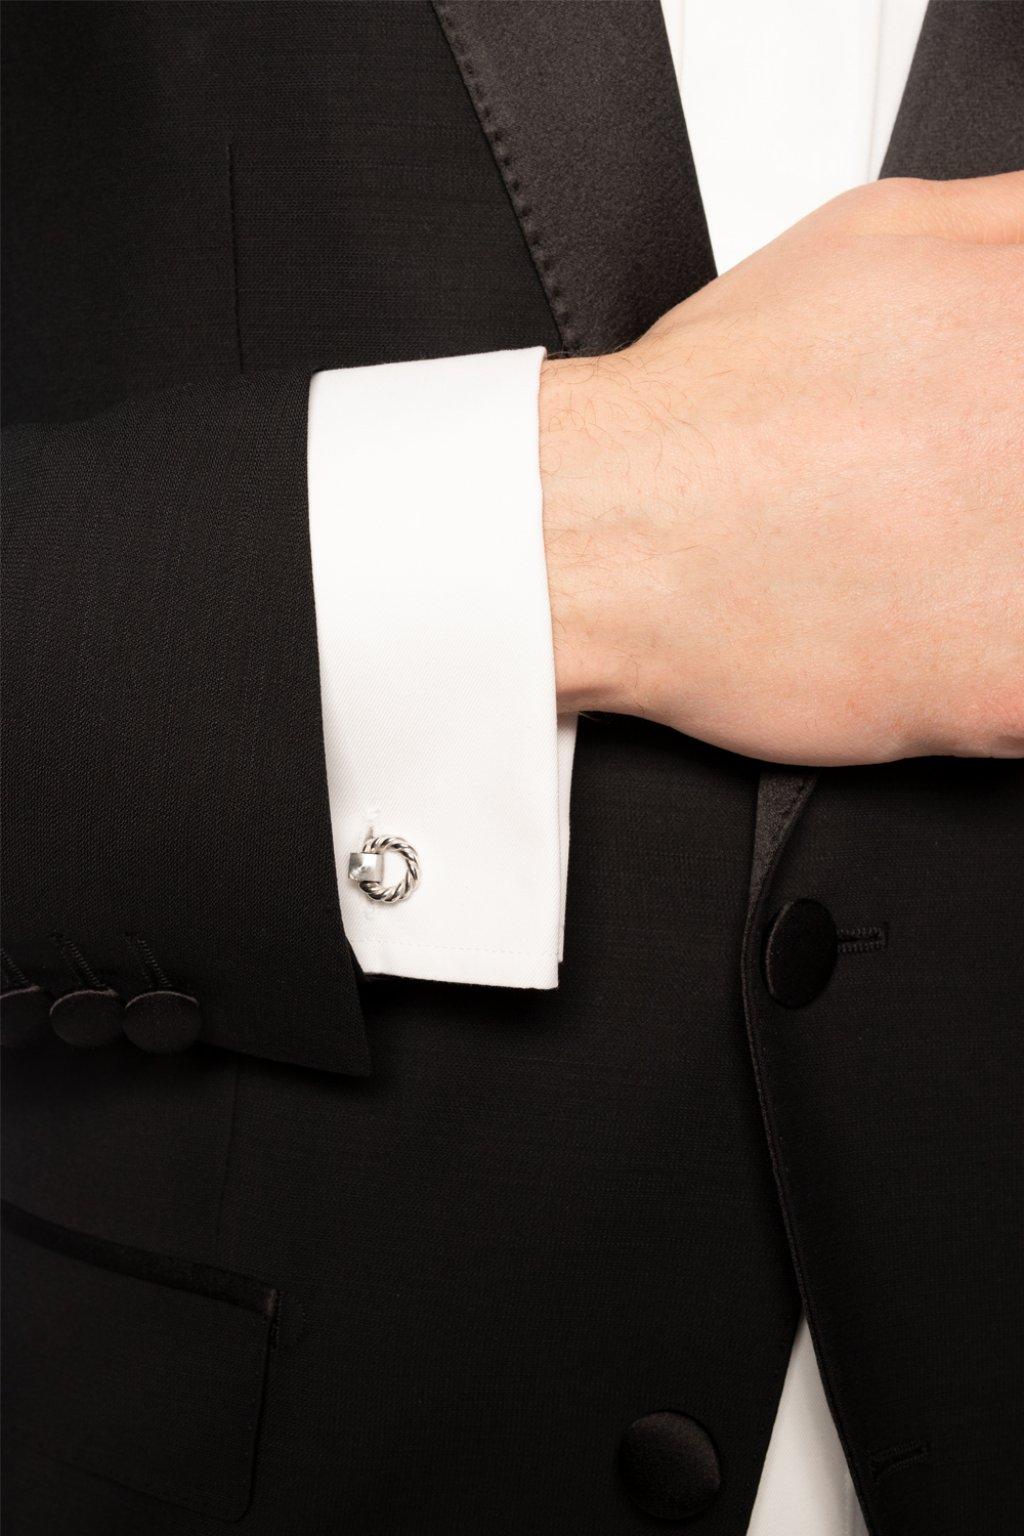 Lanvin Embossed cuff links